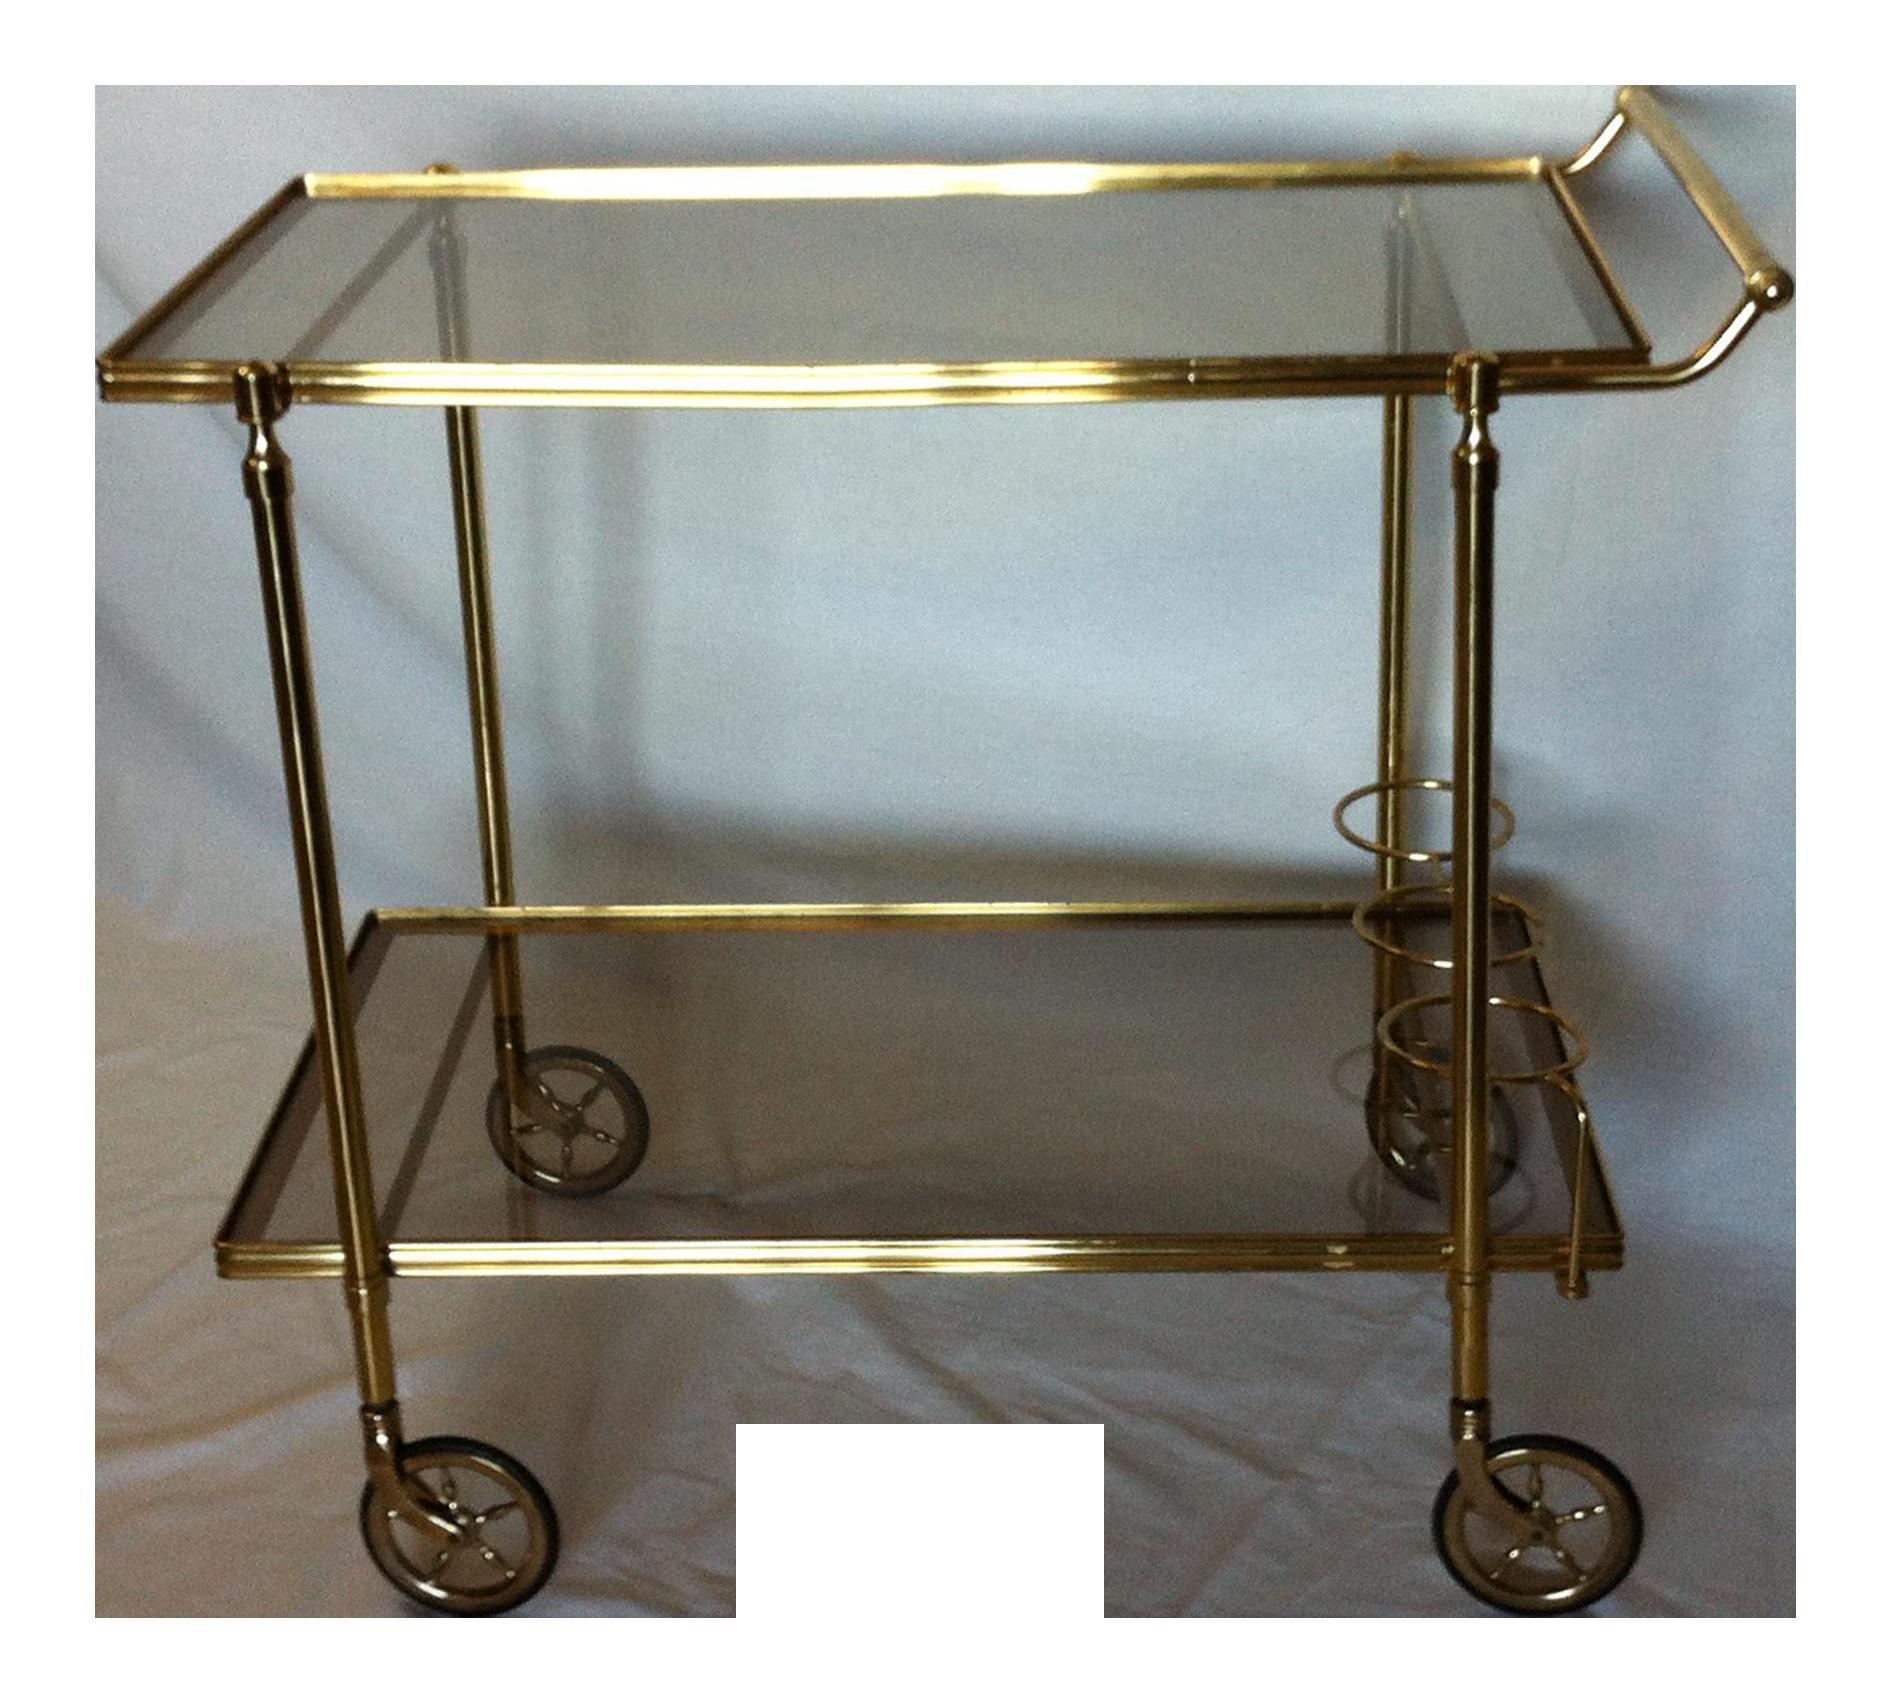 maison baques italian brass bar cart chairish. Black Bedroom Furniture Sets. Home Design Ideas